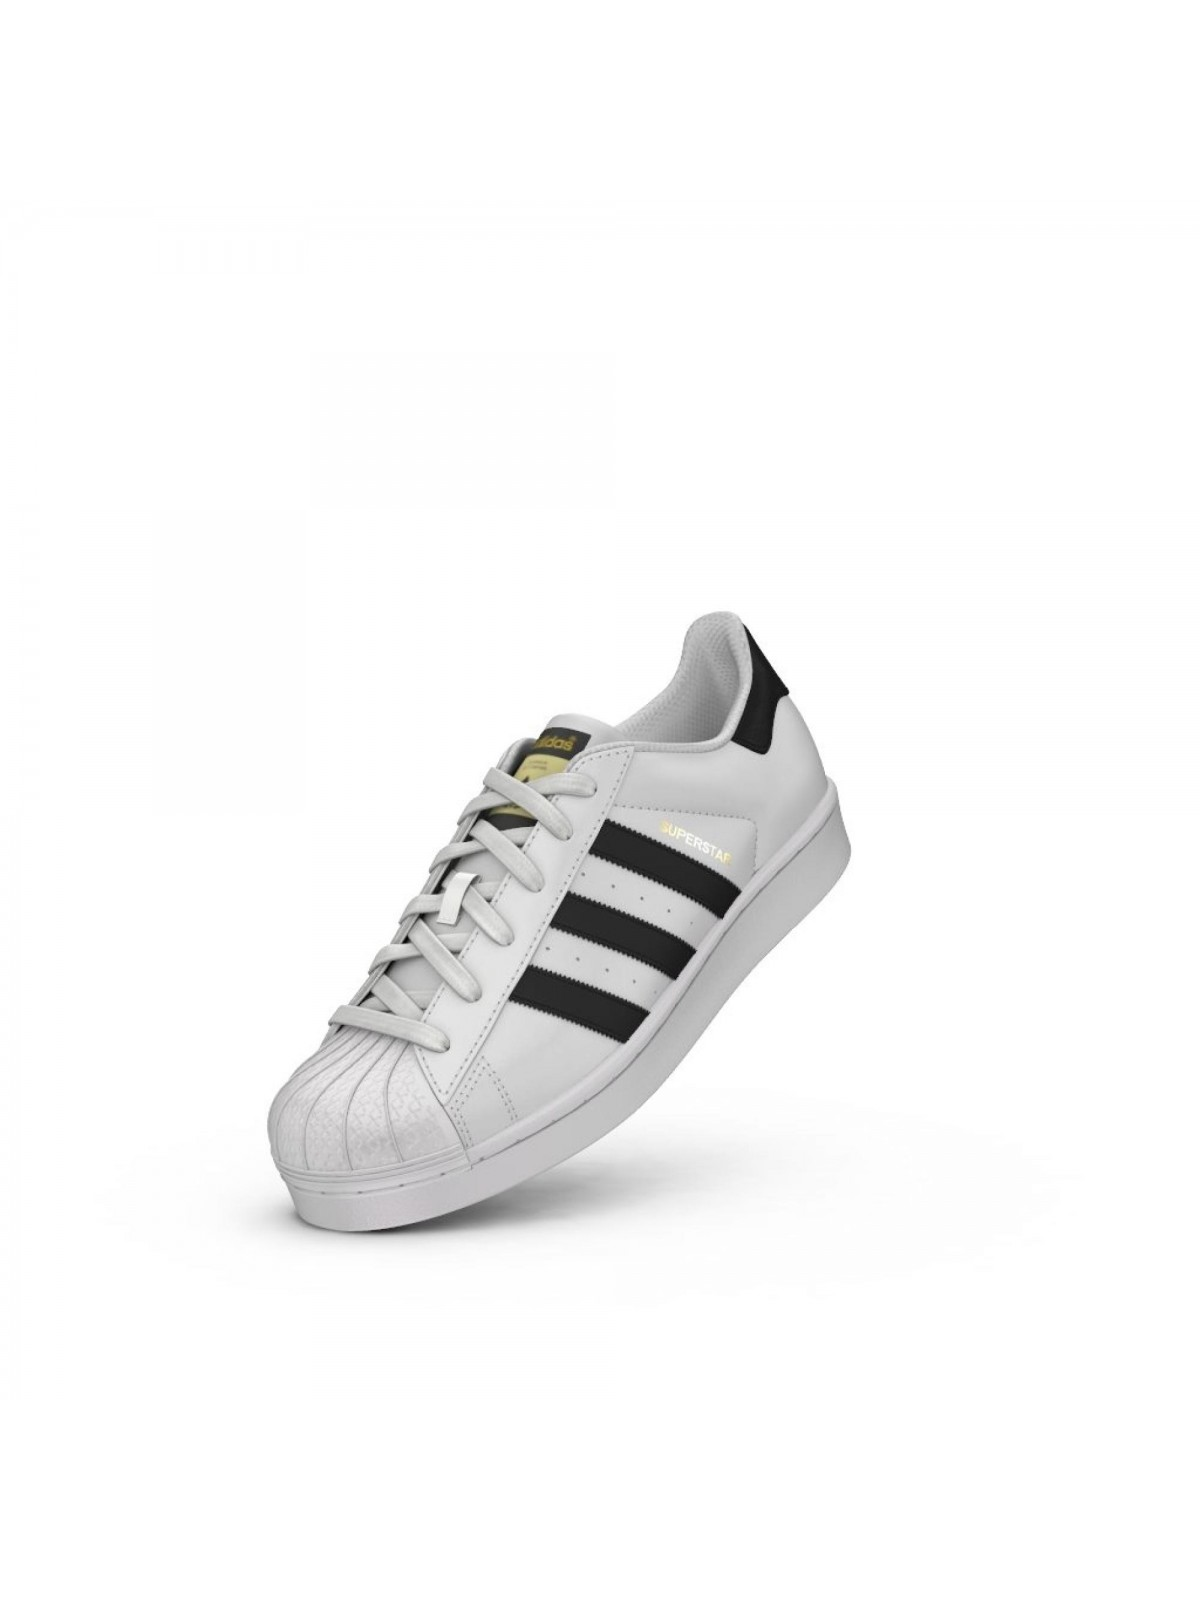 ADIDAS Superstar cuir blanc / noir / or - Superstar - ADIDAS - Marques